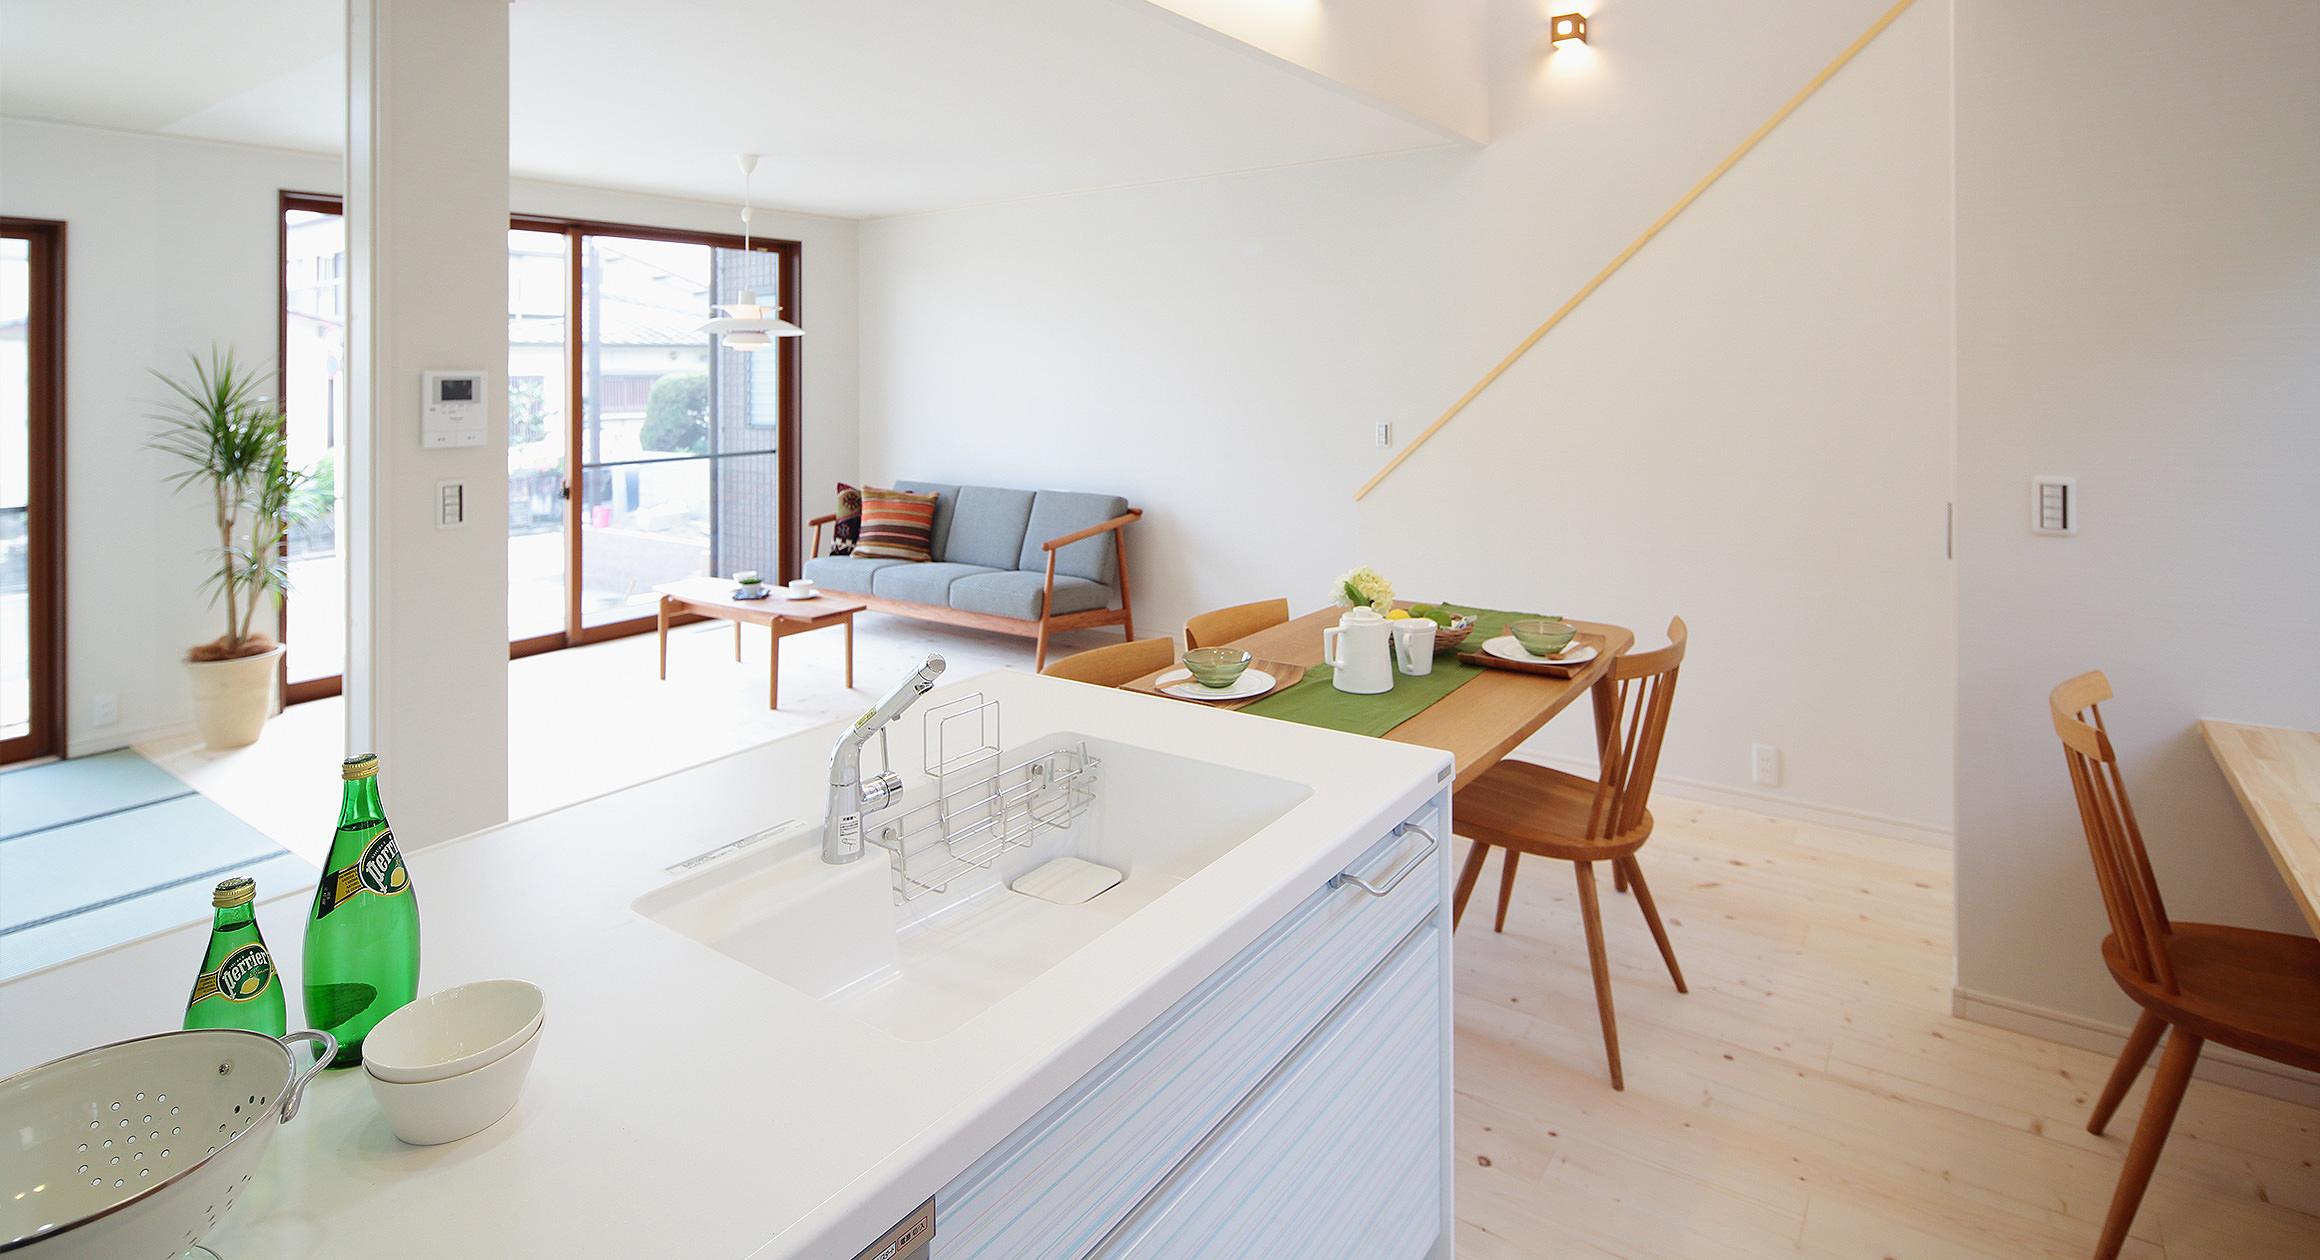 三友工務店の新築注文住宅 熊本市G様邸